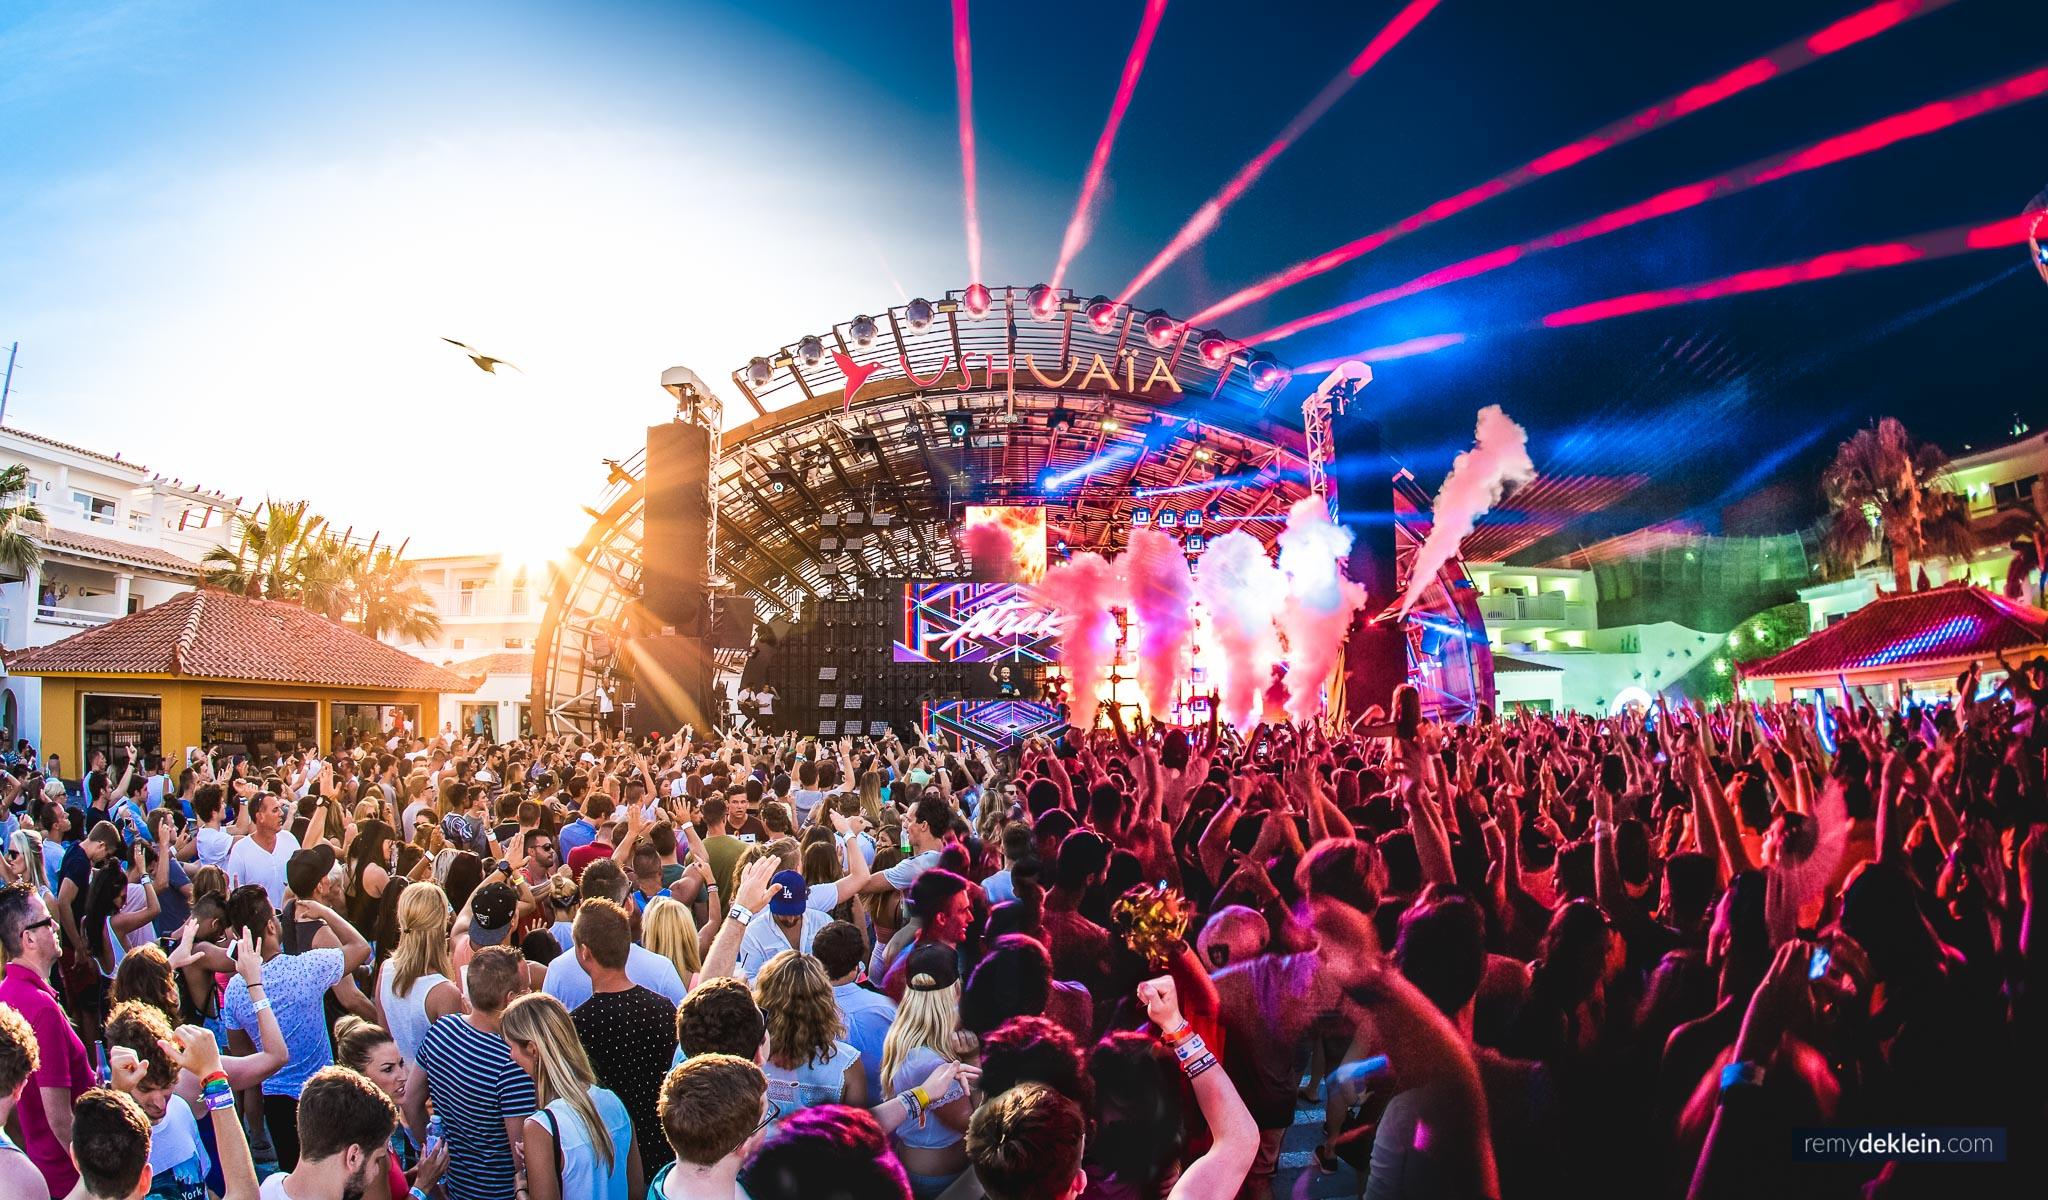 Ushuaia Ibiza at Martin Garrix Multiply with A-Trak